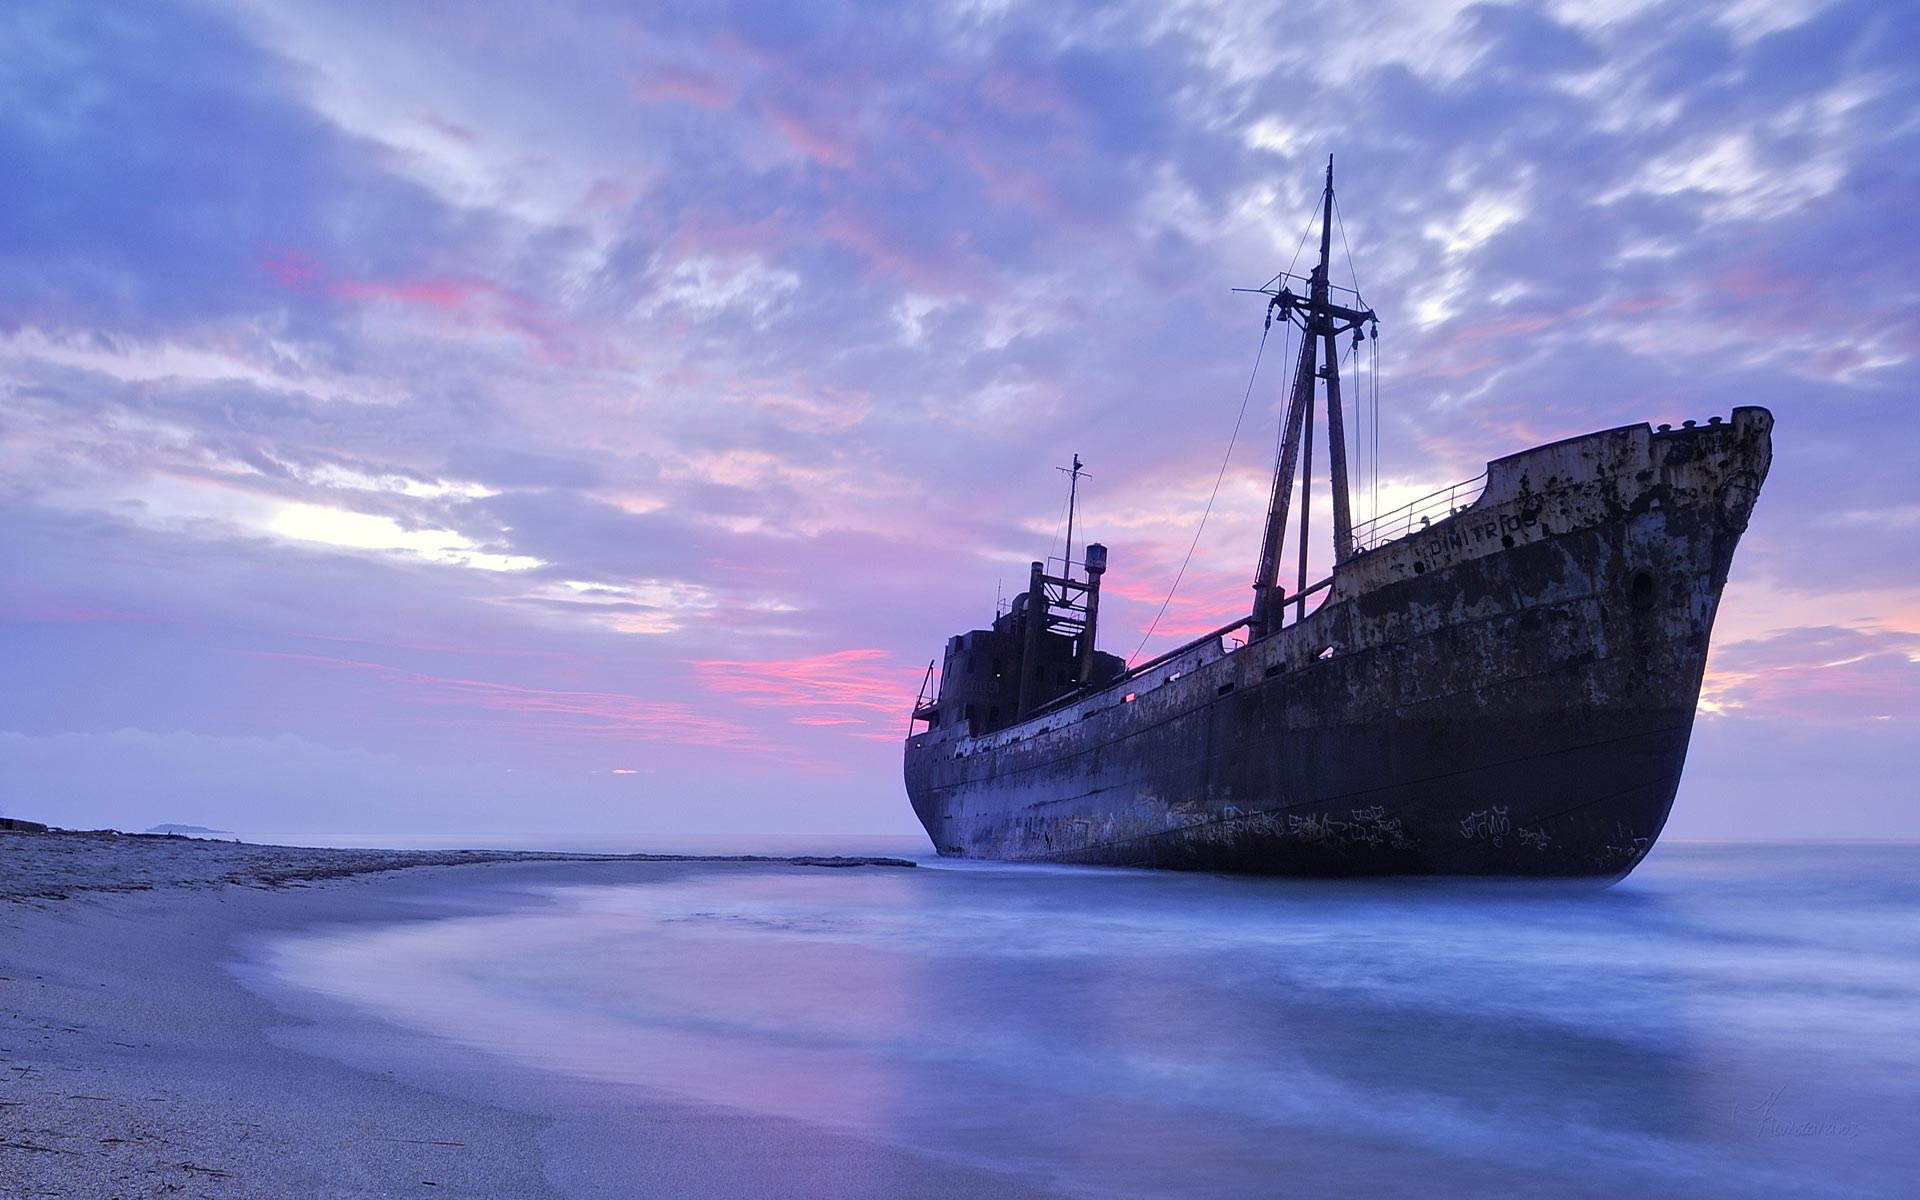 shipwreck wallpapers WallpaperUP